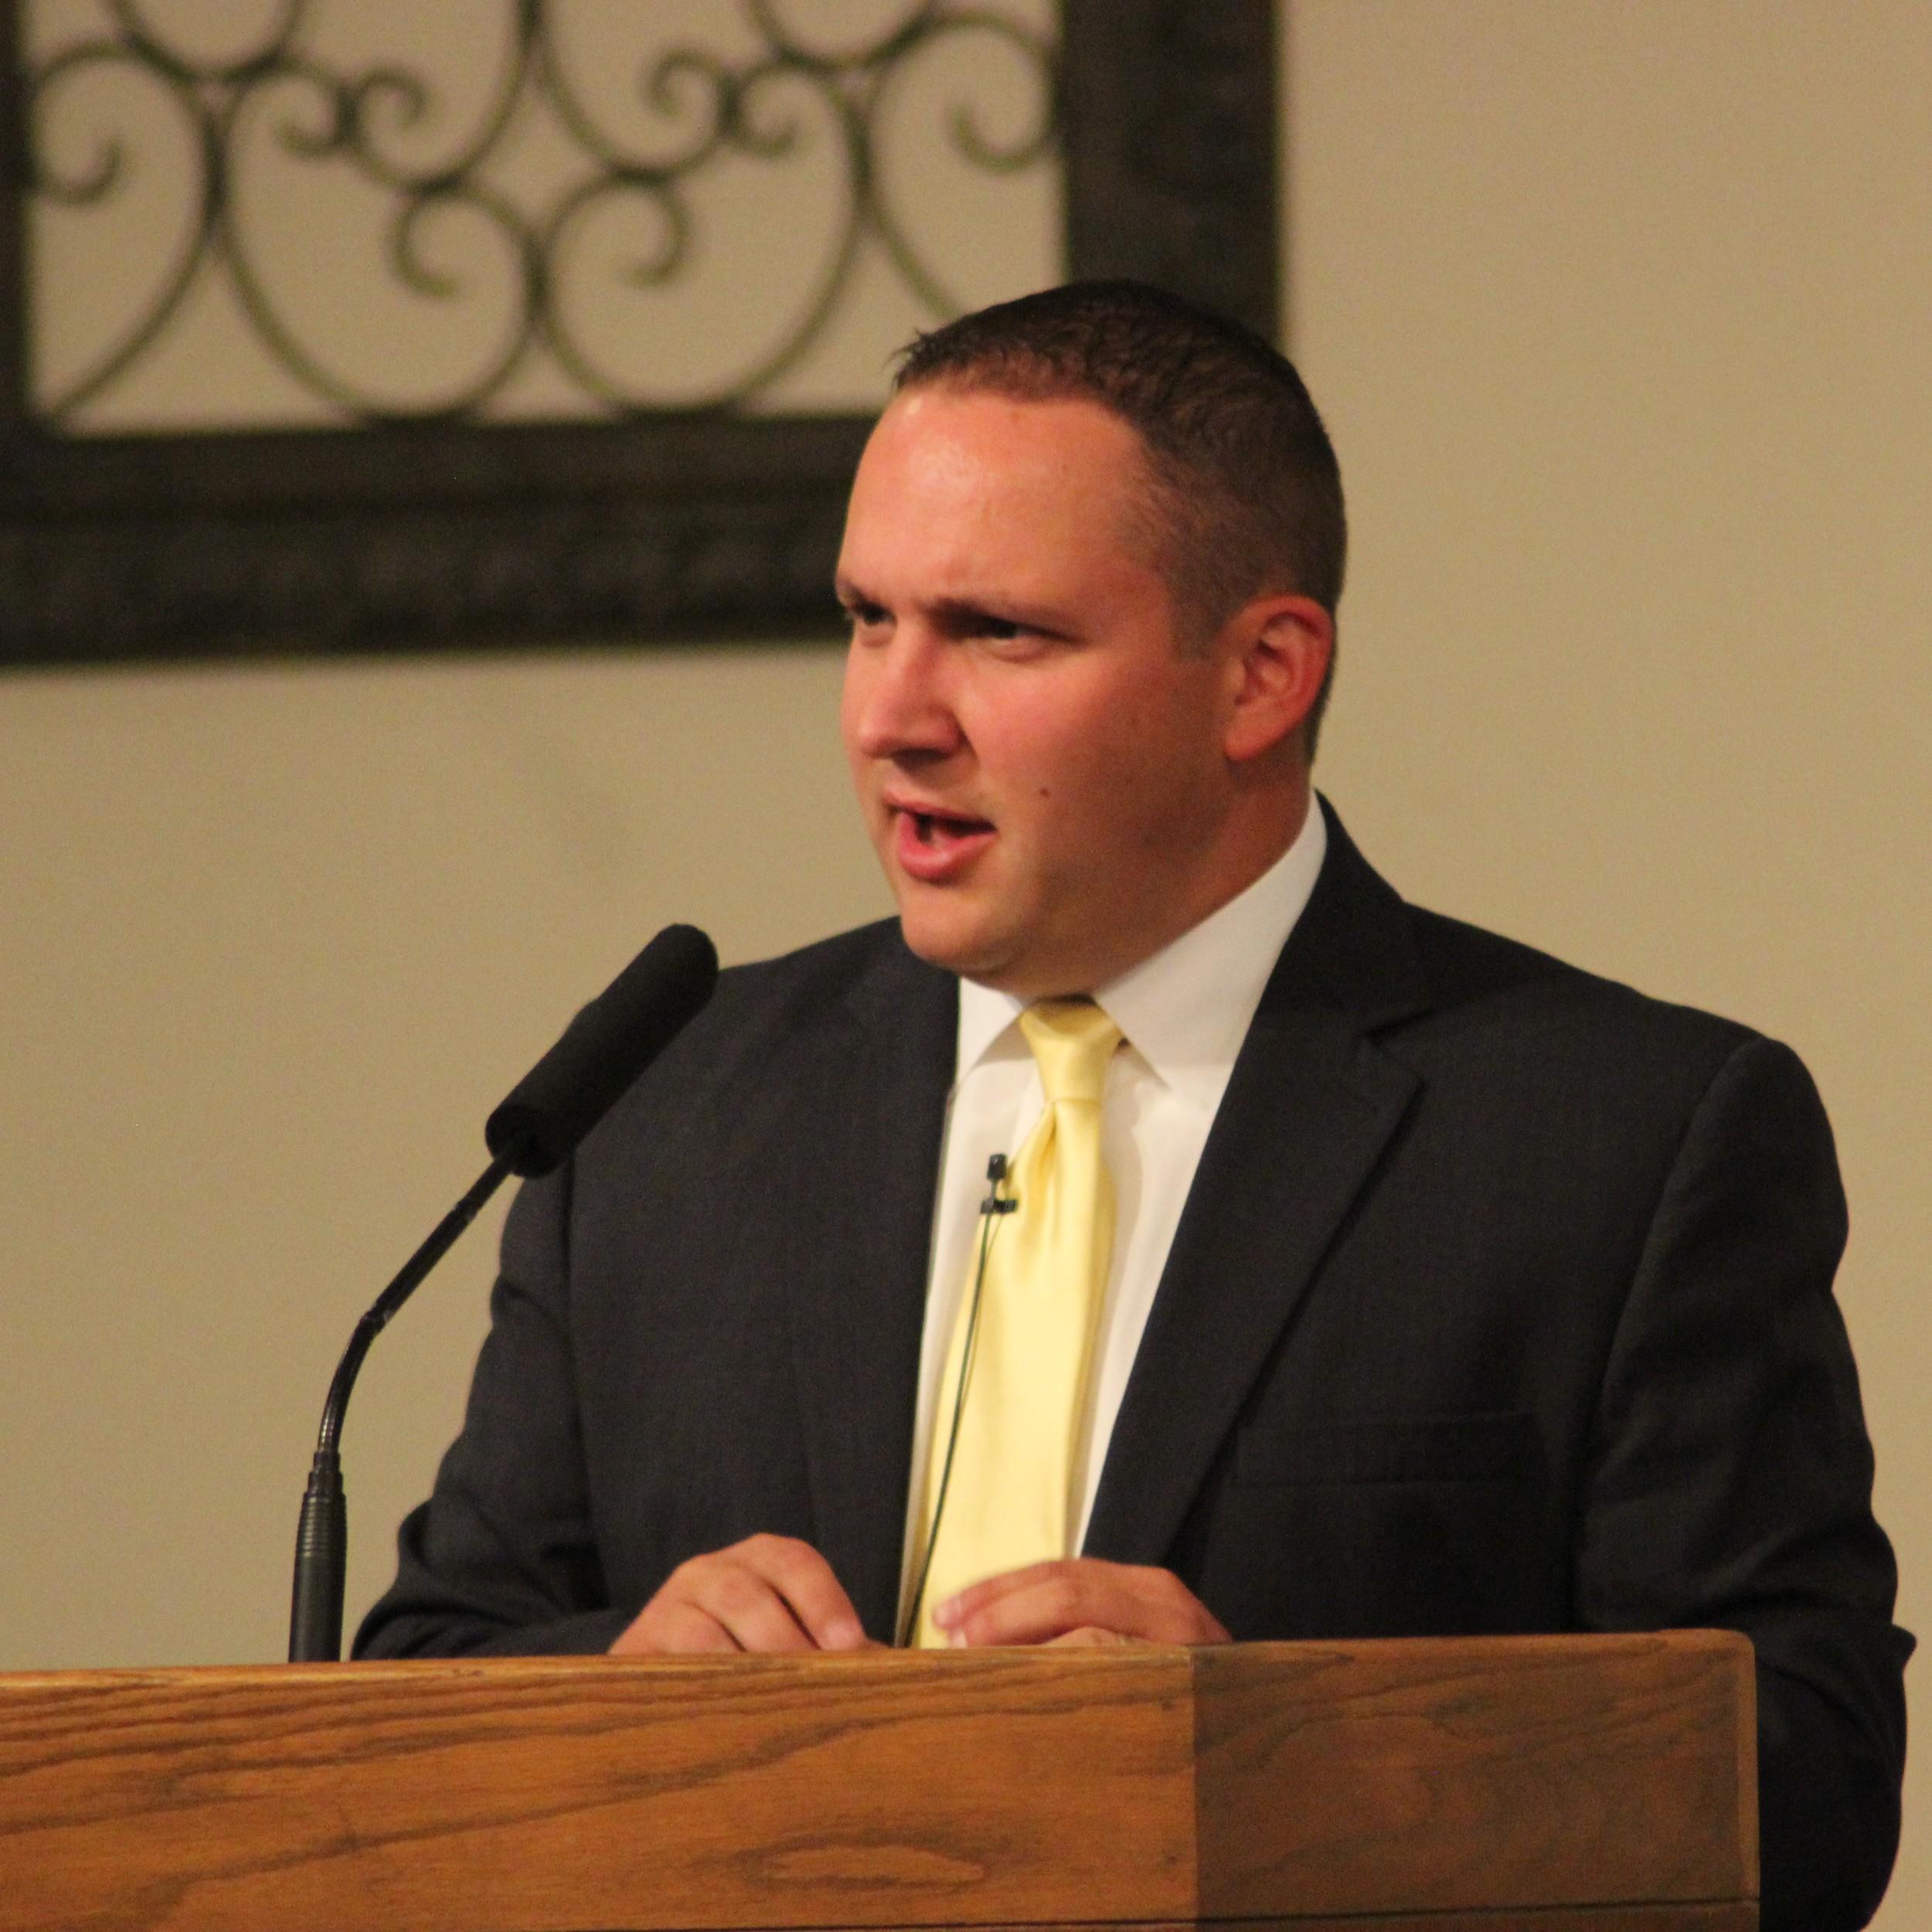 Pastor Joe Decker